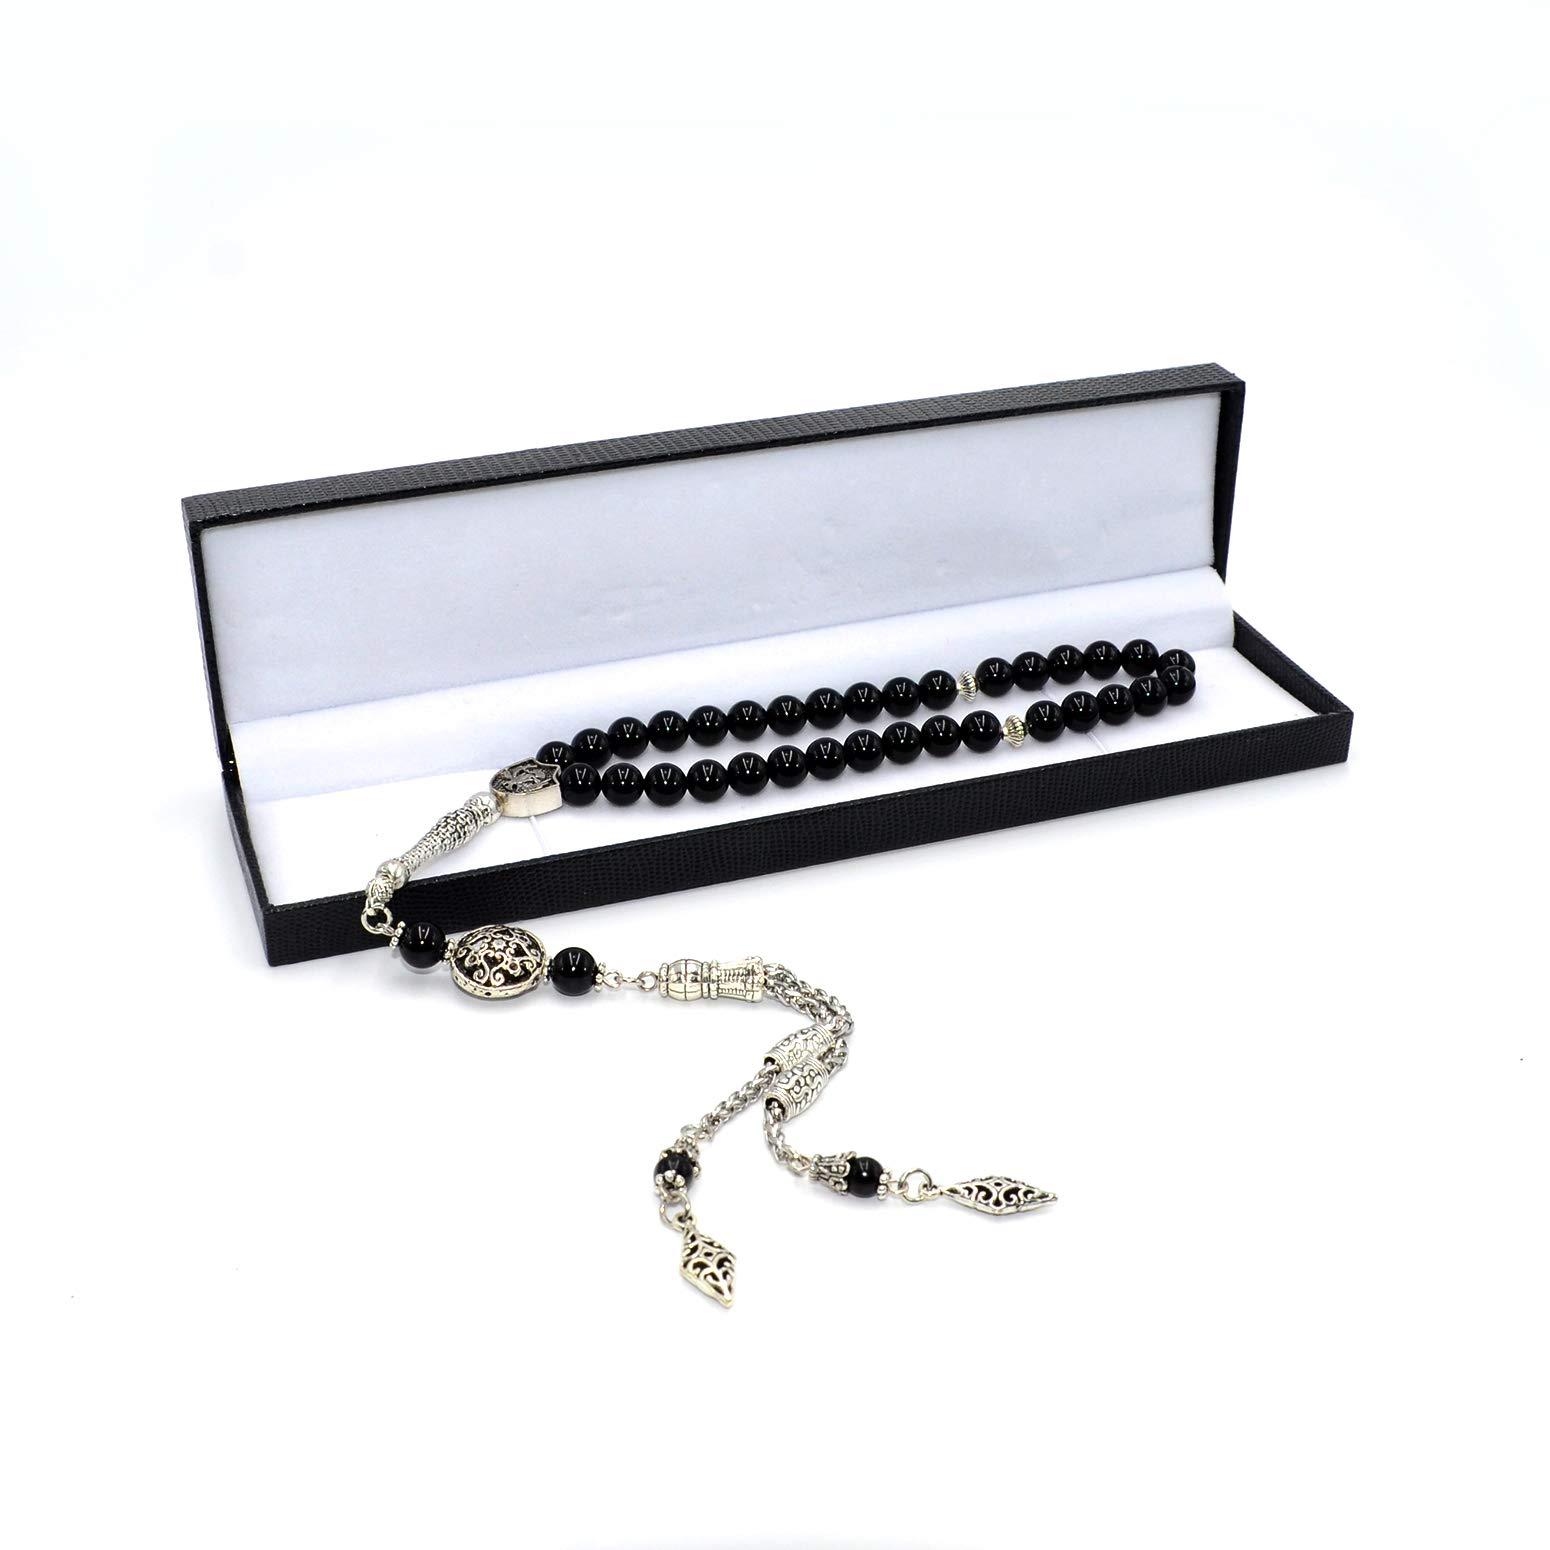 Stylist Black Onyx Prayer Beads (8 mm-33 Beads) Tesbih-Tasbih-Tasbeeh-Misbaha-Masbaha-Subha-Sebha-Sibha-Rosary-Worry Beads